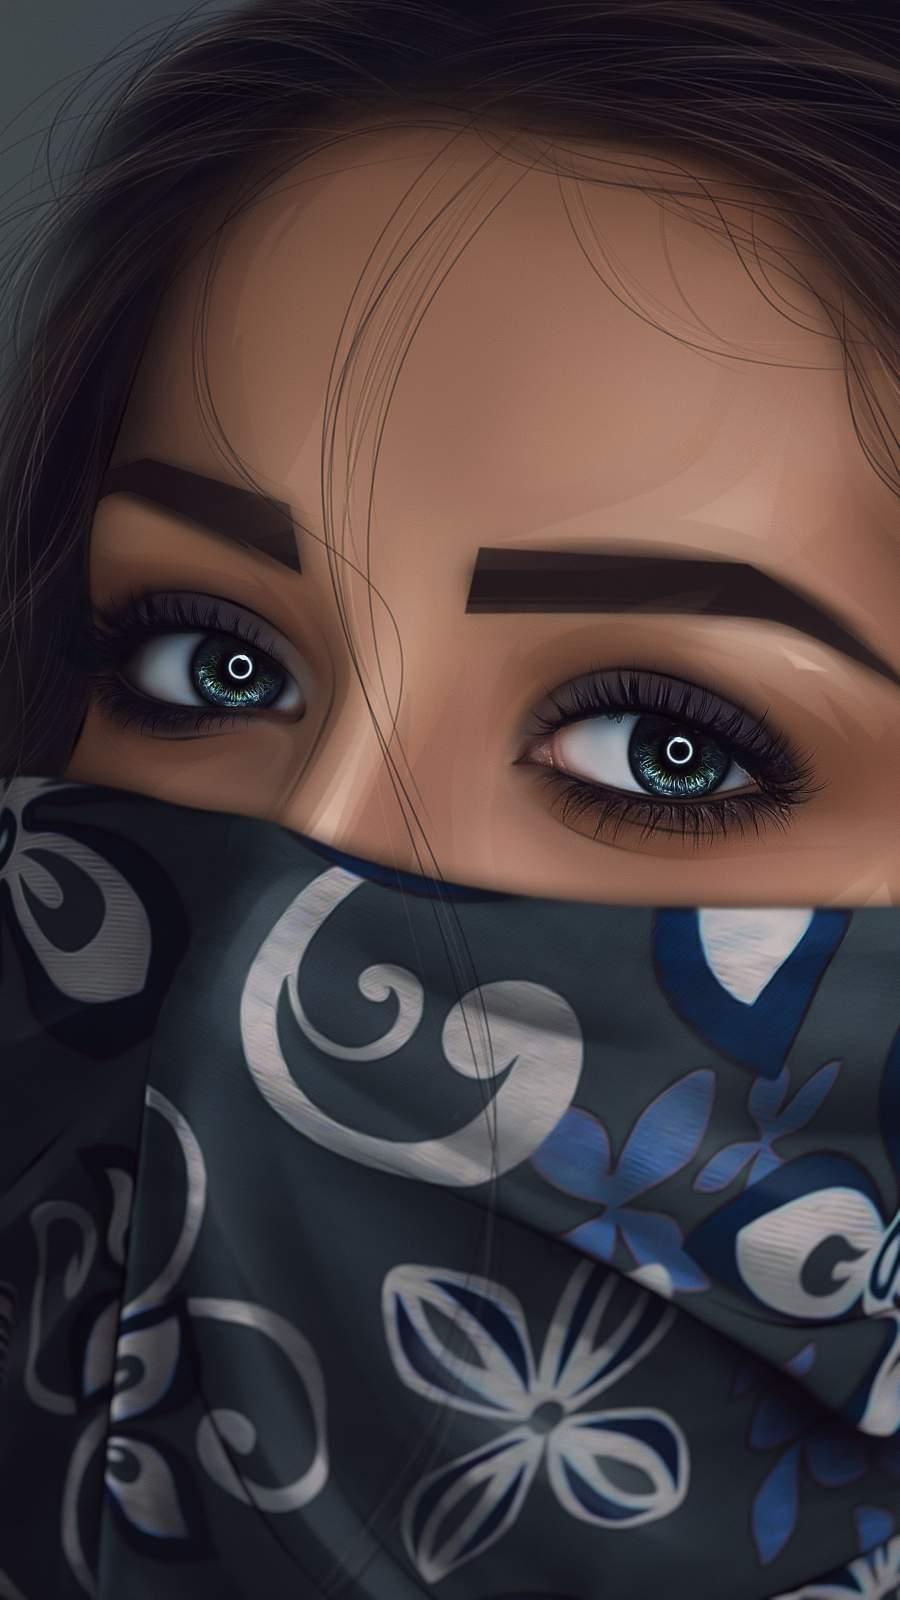 Mask Girl Beautiful Eyes iPhone Wallpaper